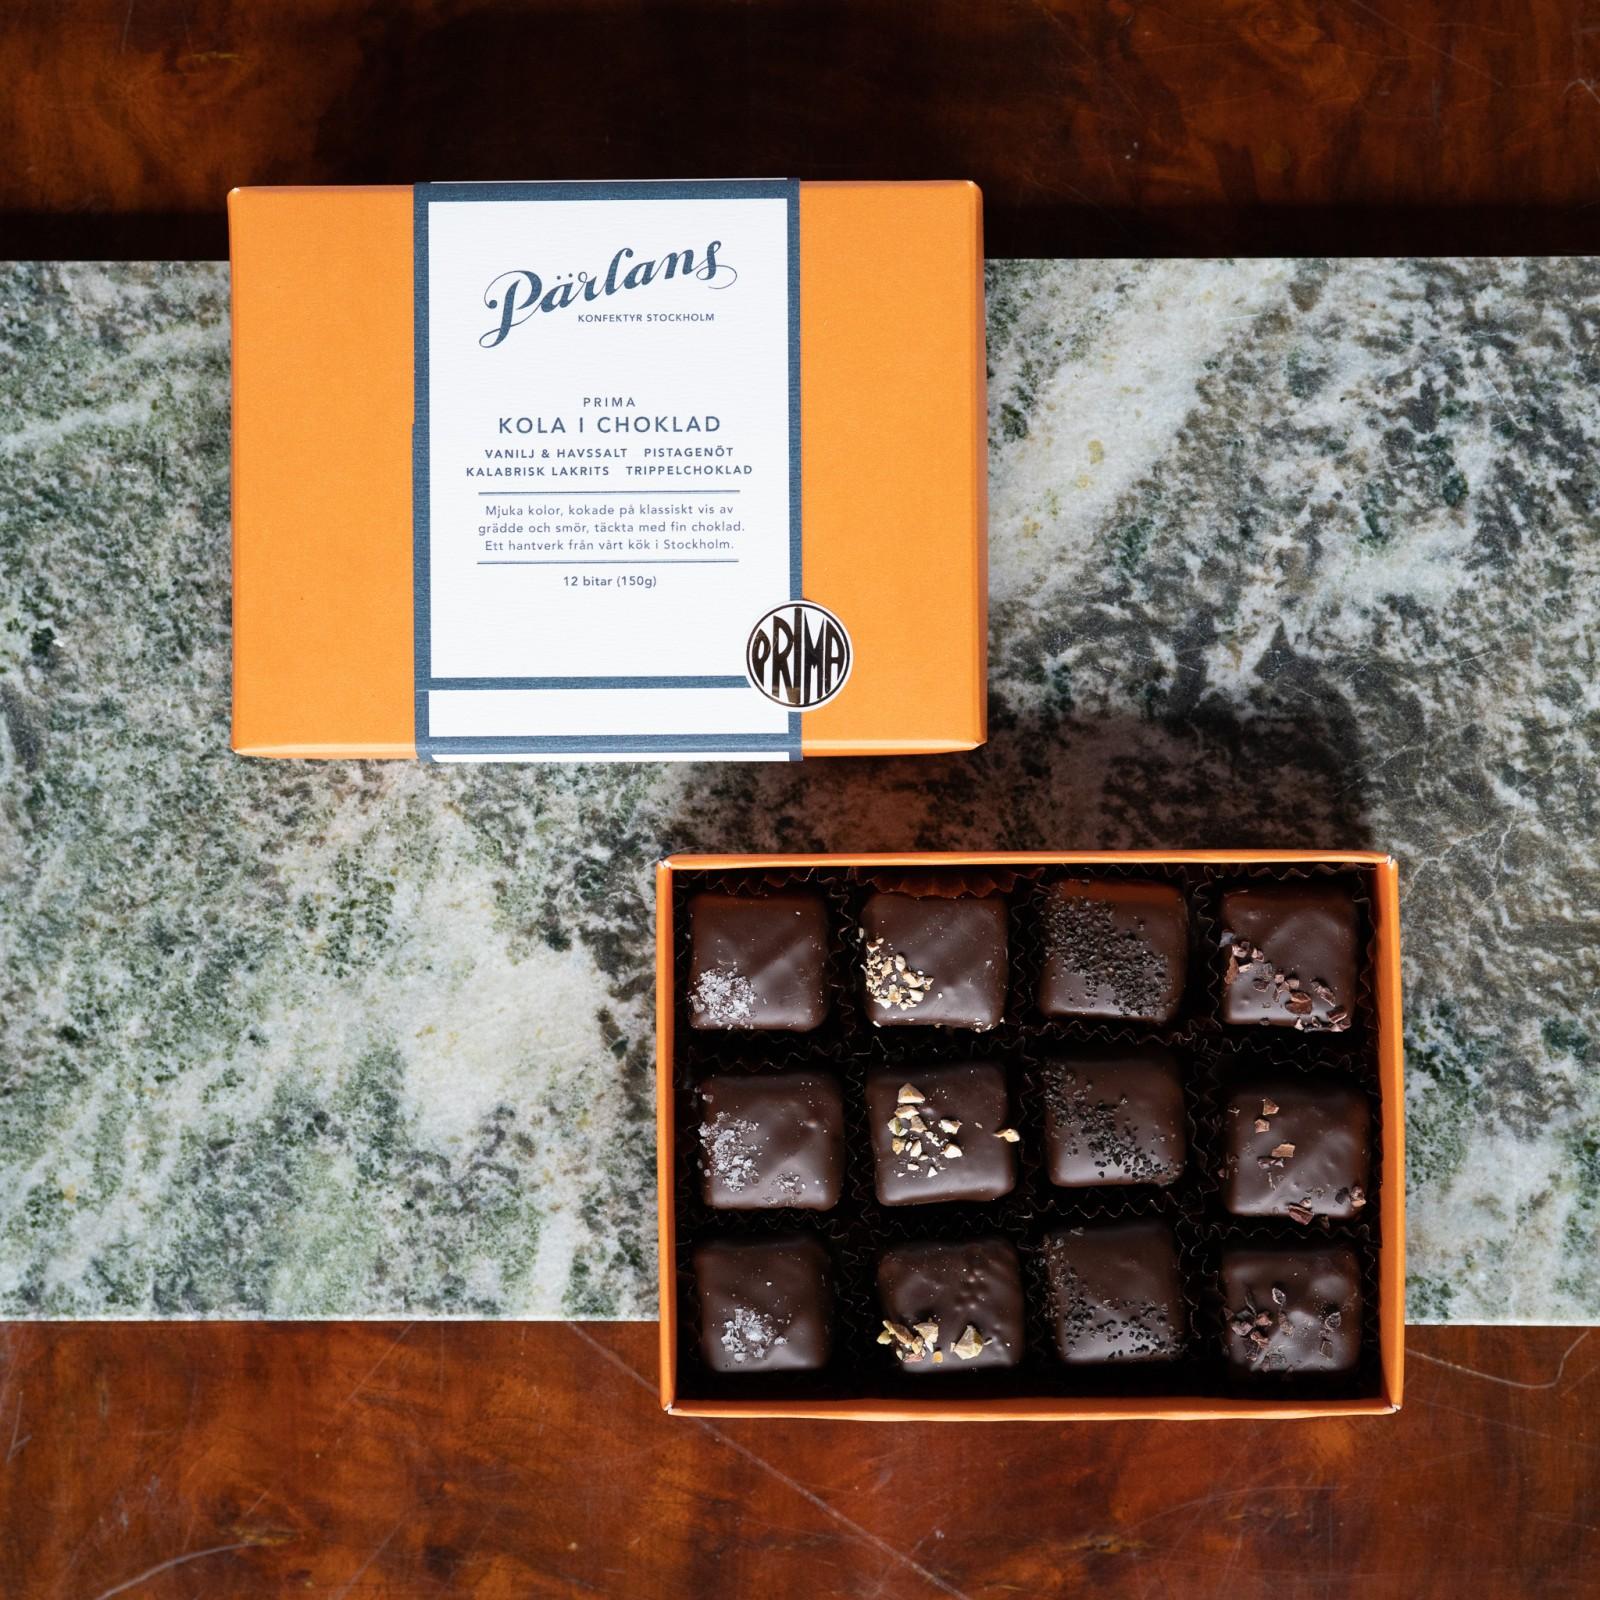 PÄRLANS - Karamell i sjokolade, 12 bitar i gåveøskje